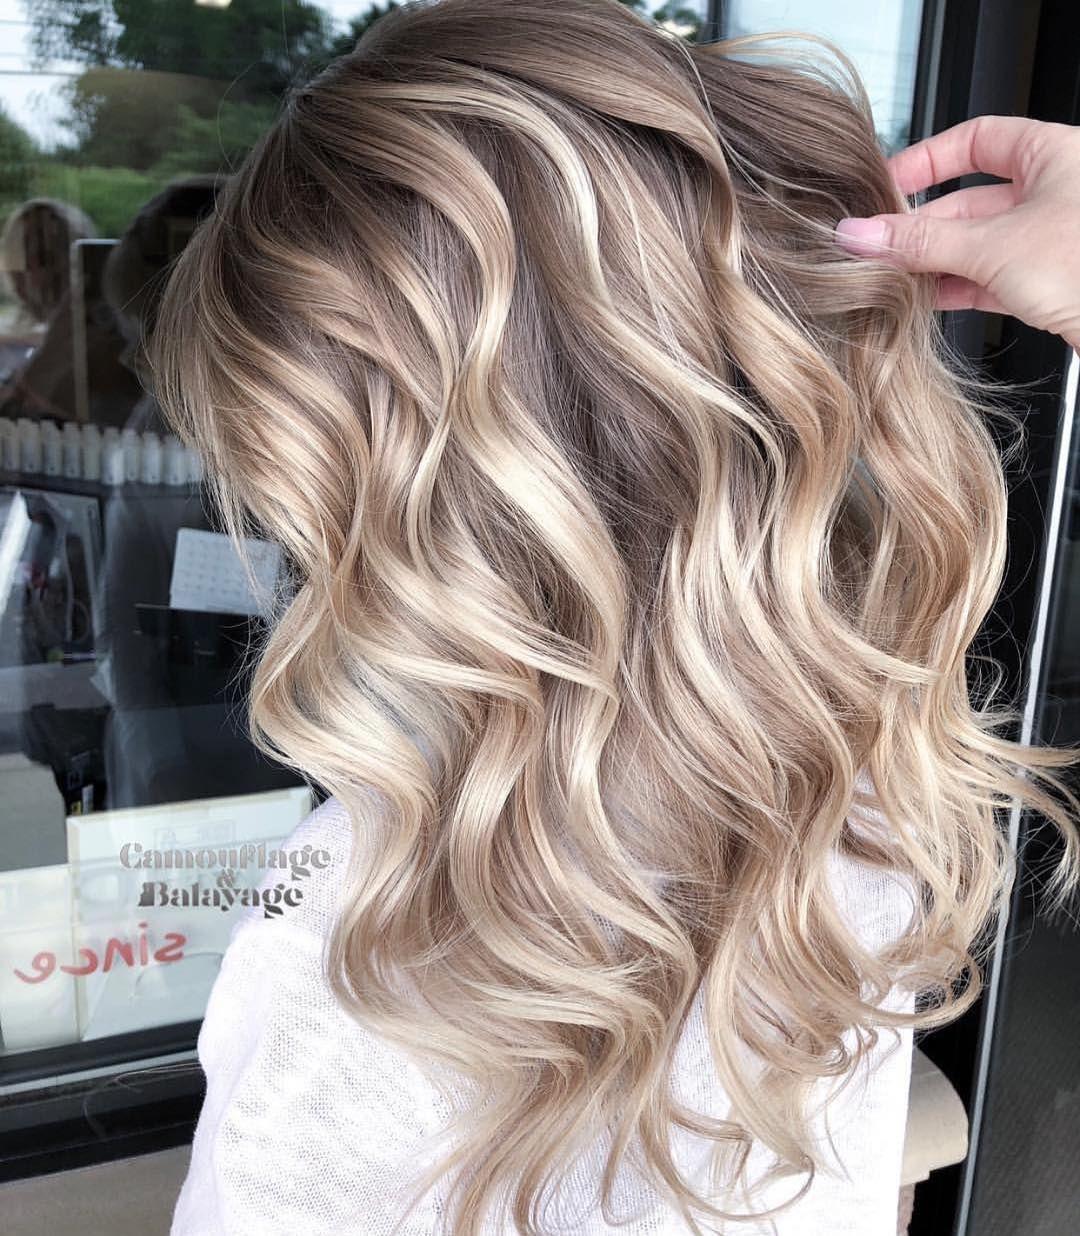 Hair Inspiration 2019-05-05 02:35:17